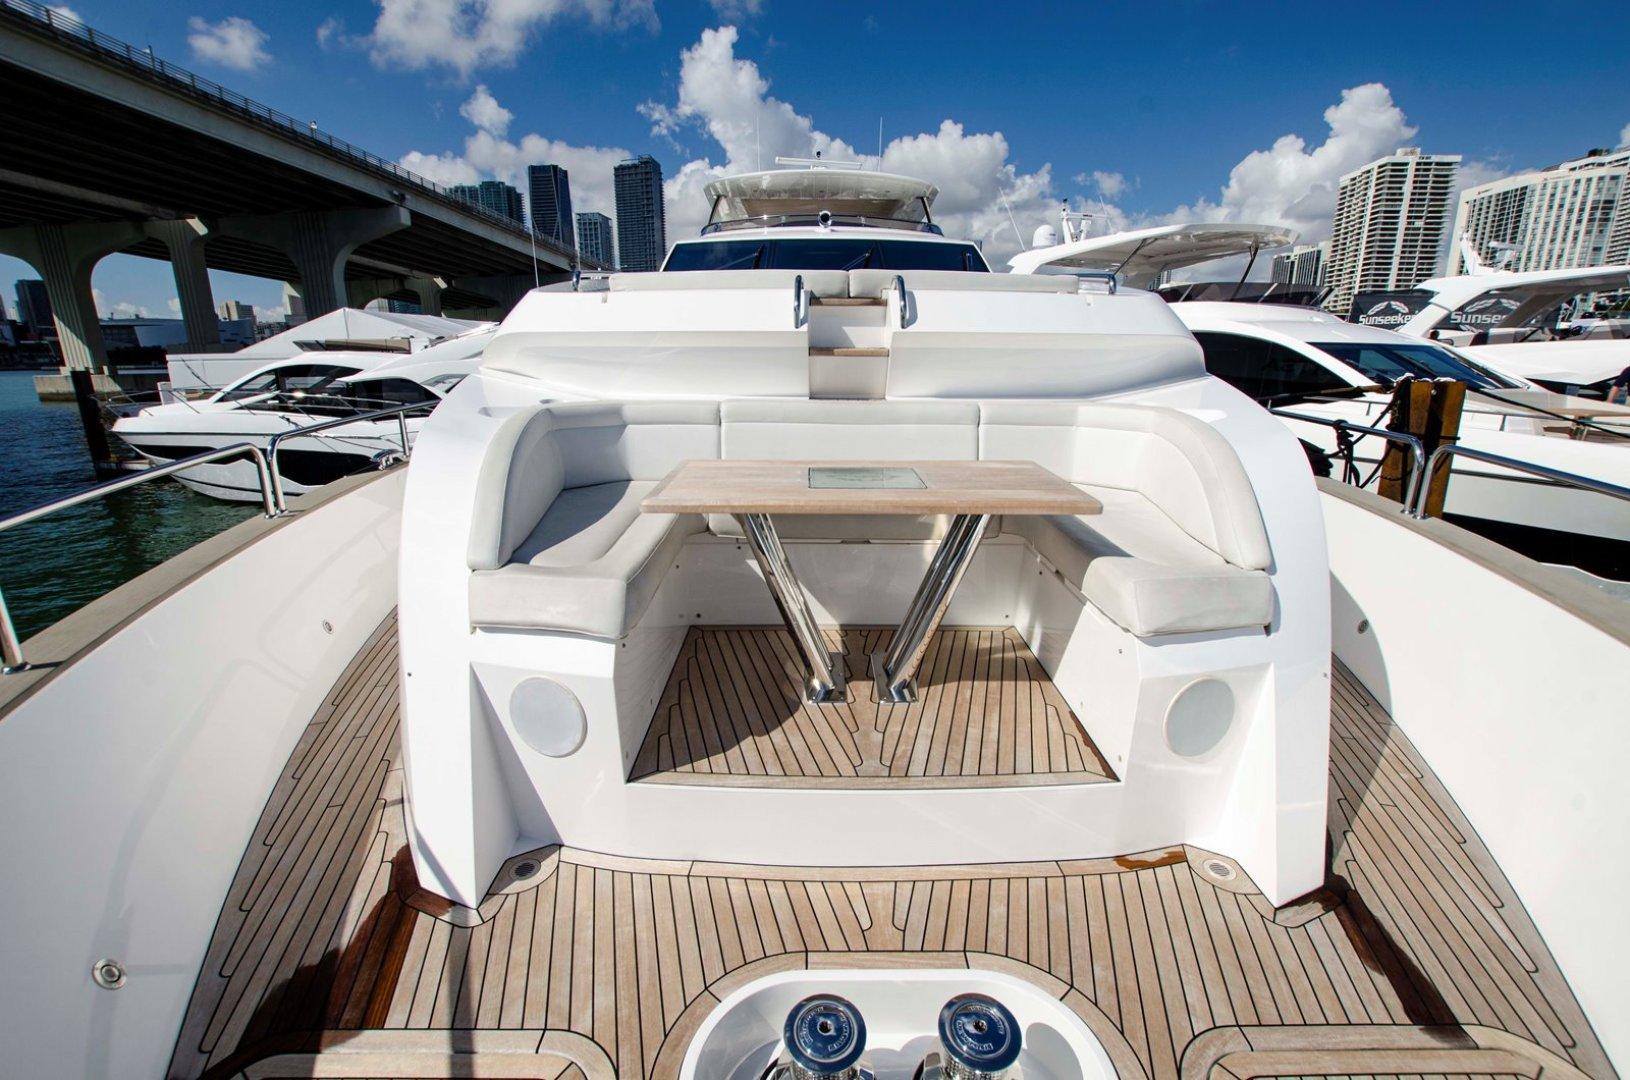 Sunseeker-YACHT 95 2017 -Dania Beach-Florida-United States-1506268 | Thumbnail